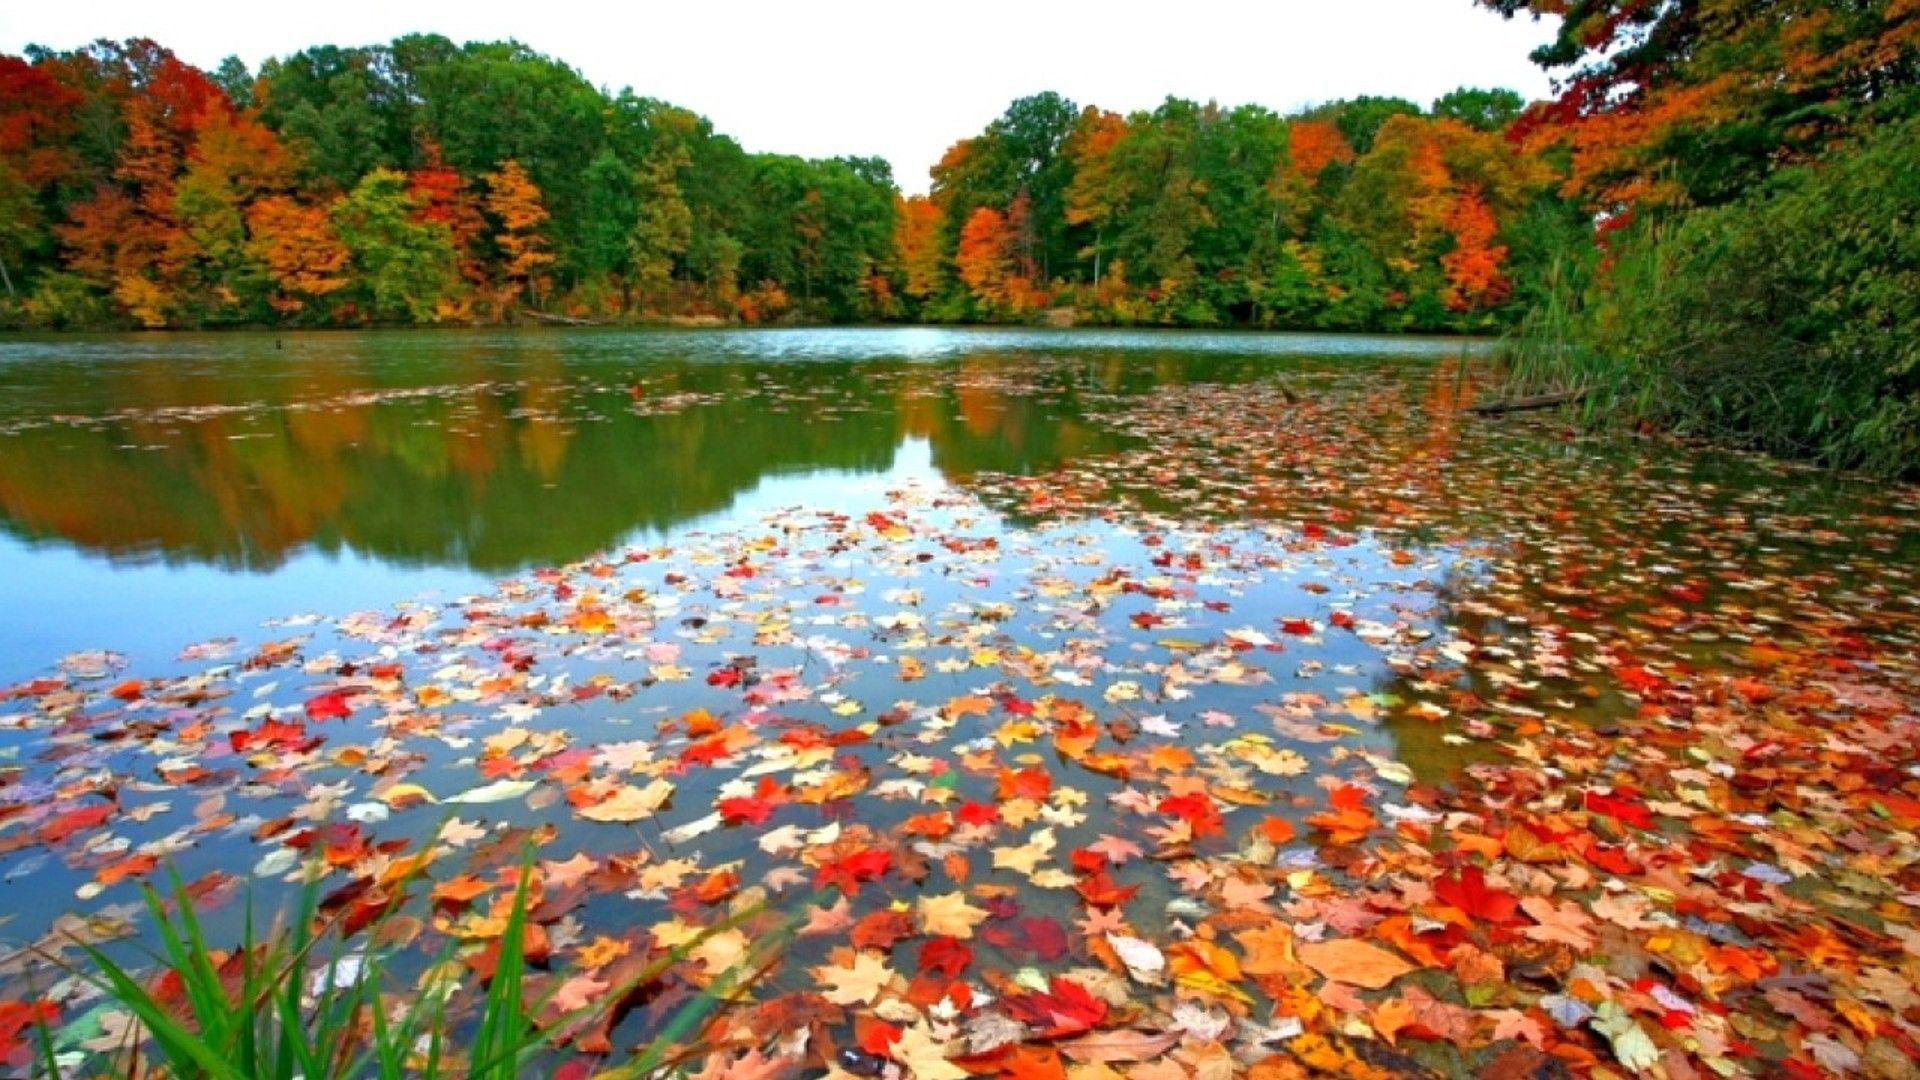 Fall Foliage Wallpapers For Desktop Wallpaper Desktop Wallpaper Fall Fall Wallpaper Autumn Leaves Wallpaper